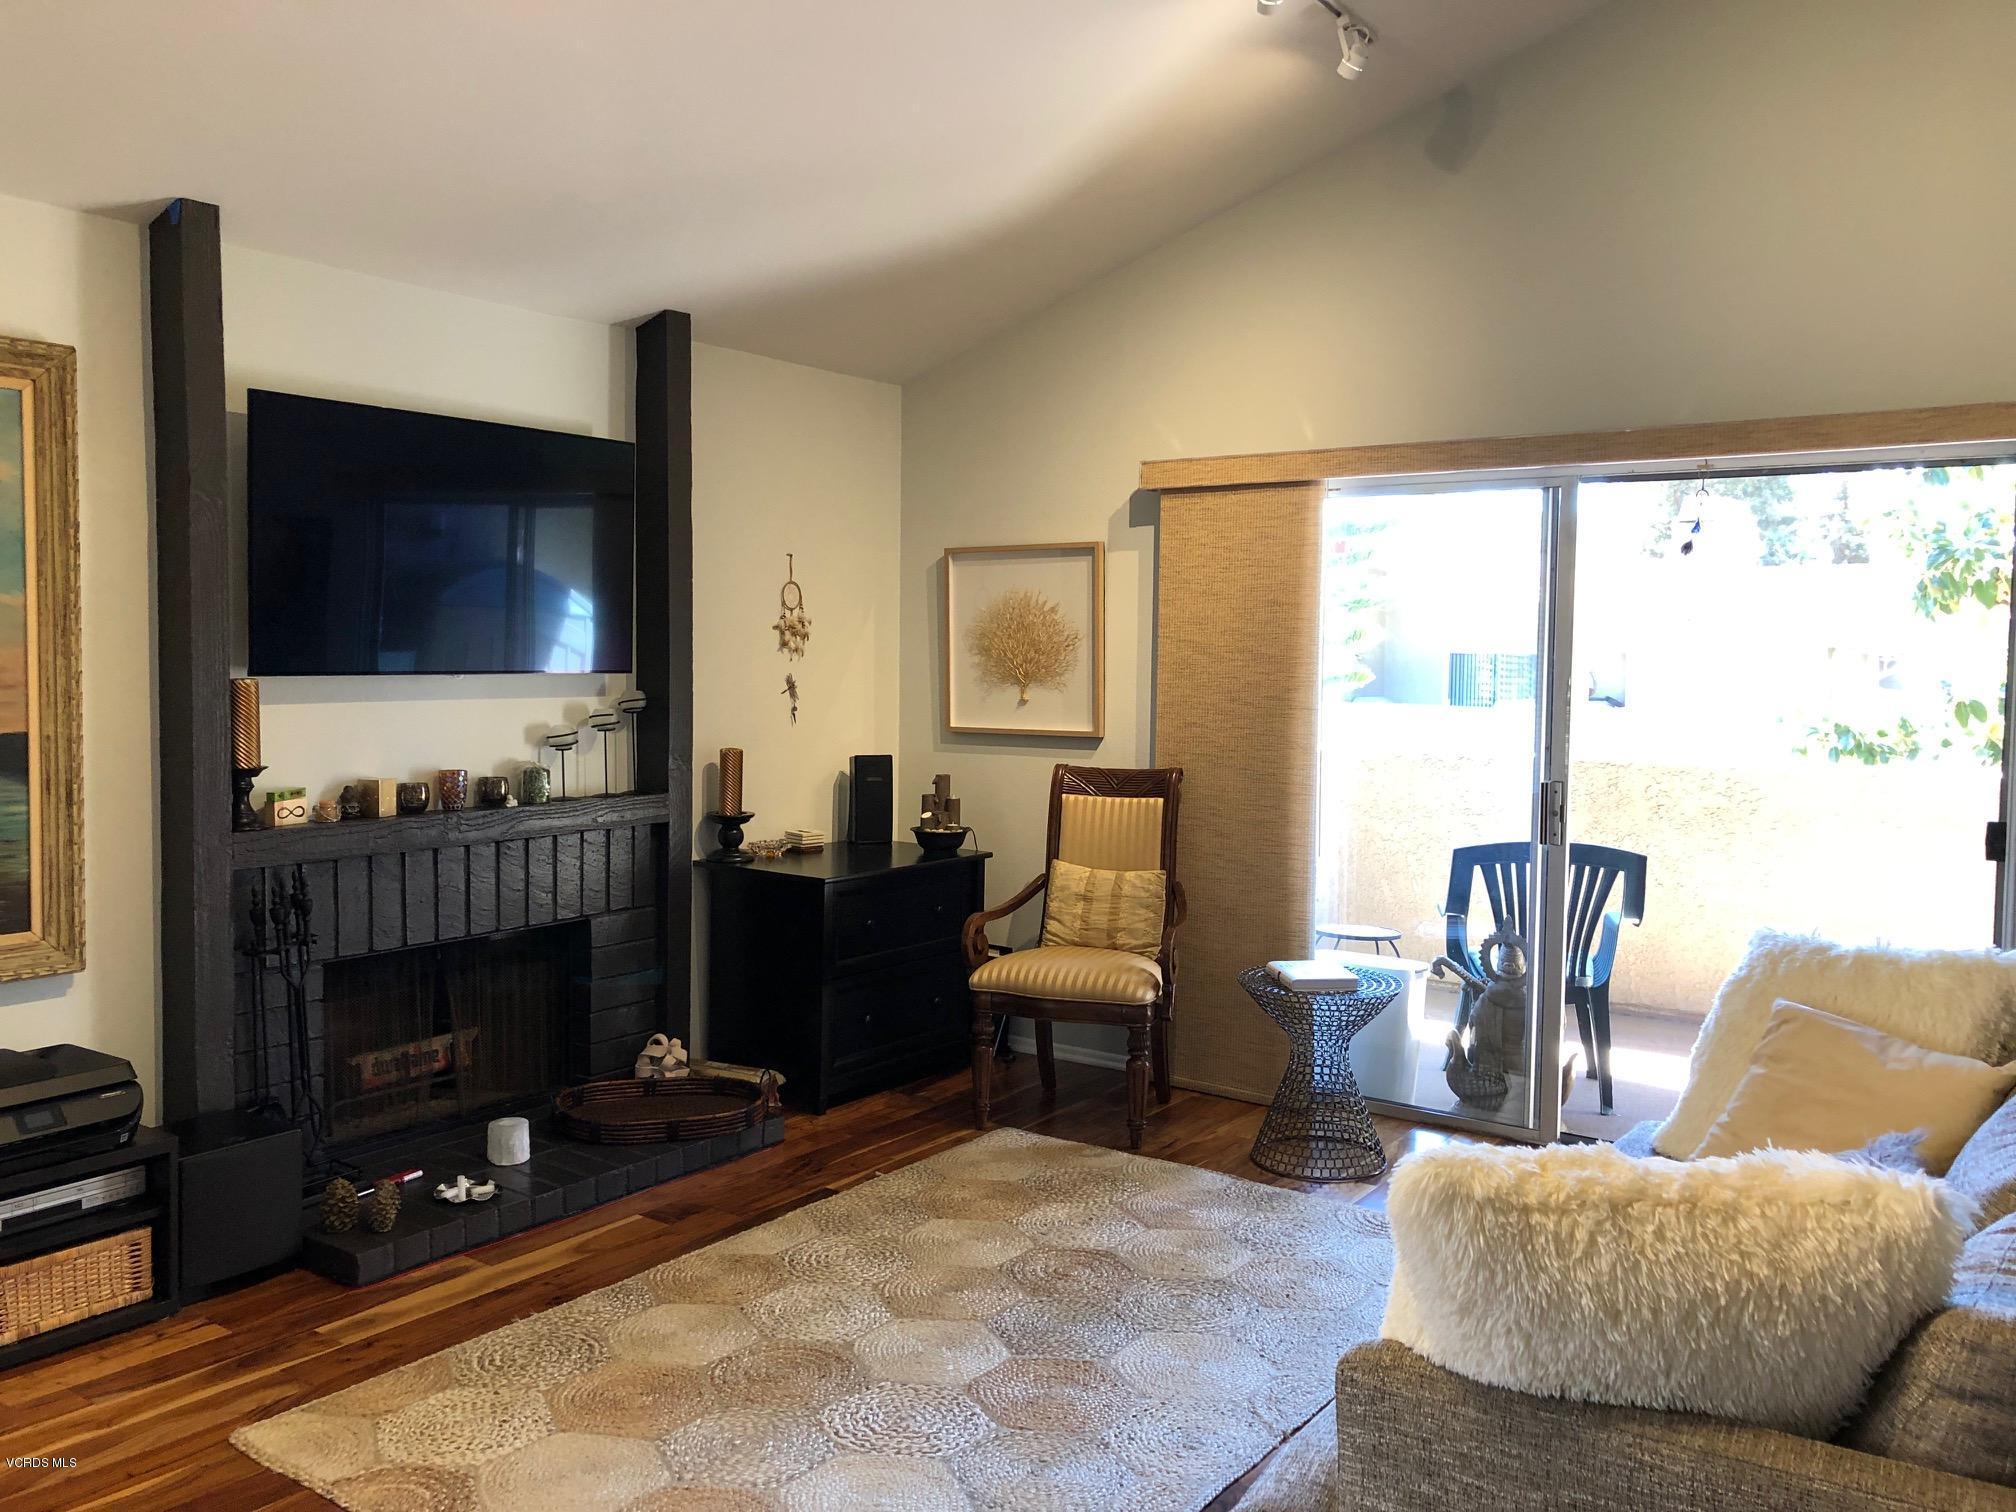 463 Arbor Ln Court, Thousand Oaks, CA 91360